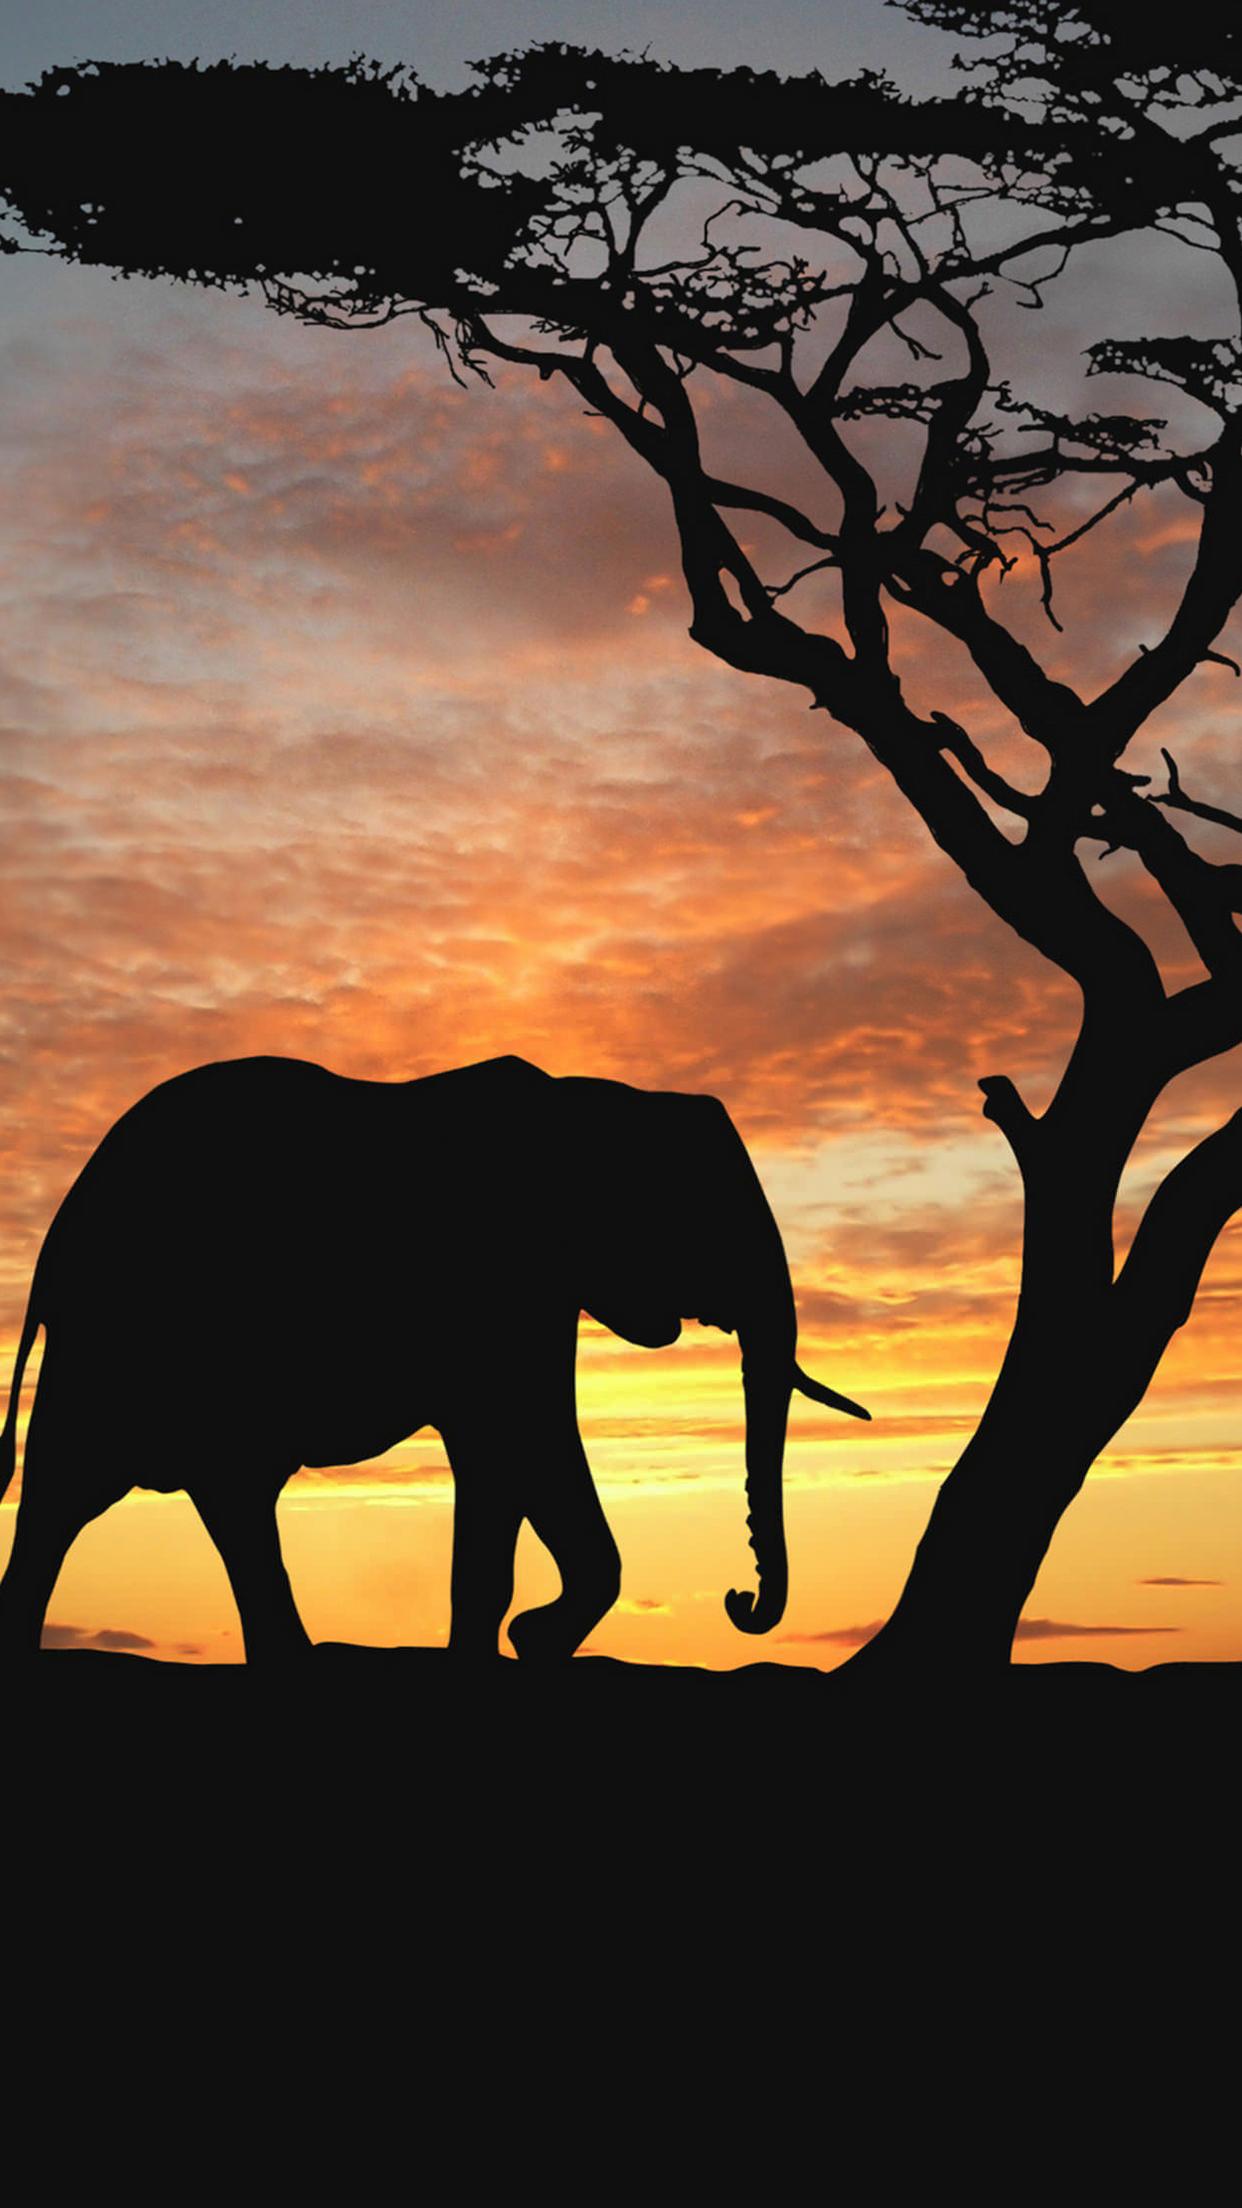 Elephant 3Wallpapers iPhone Parallax Elephant